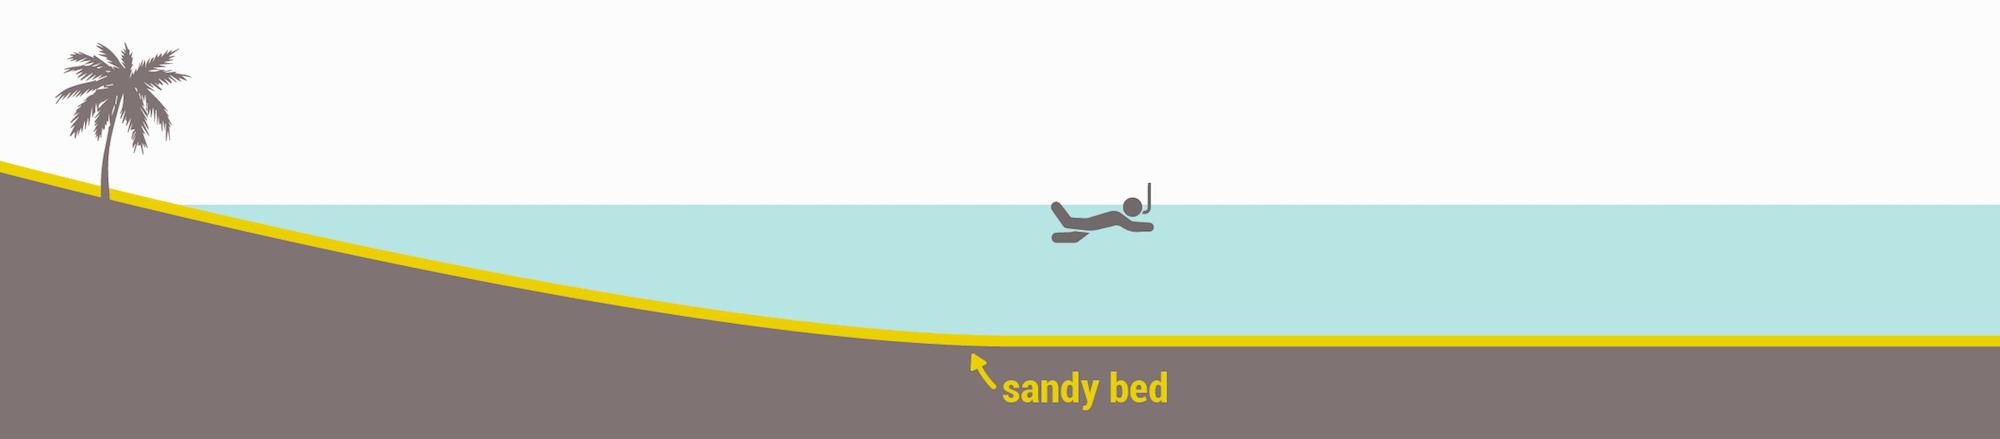 Snorkeling spots types - Sandy seabed